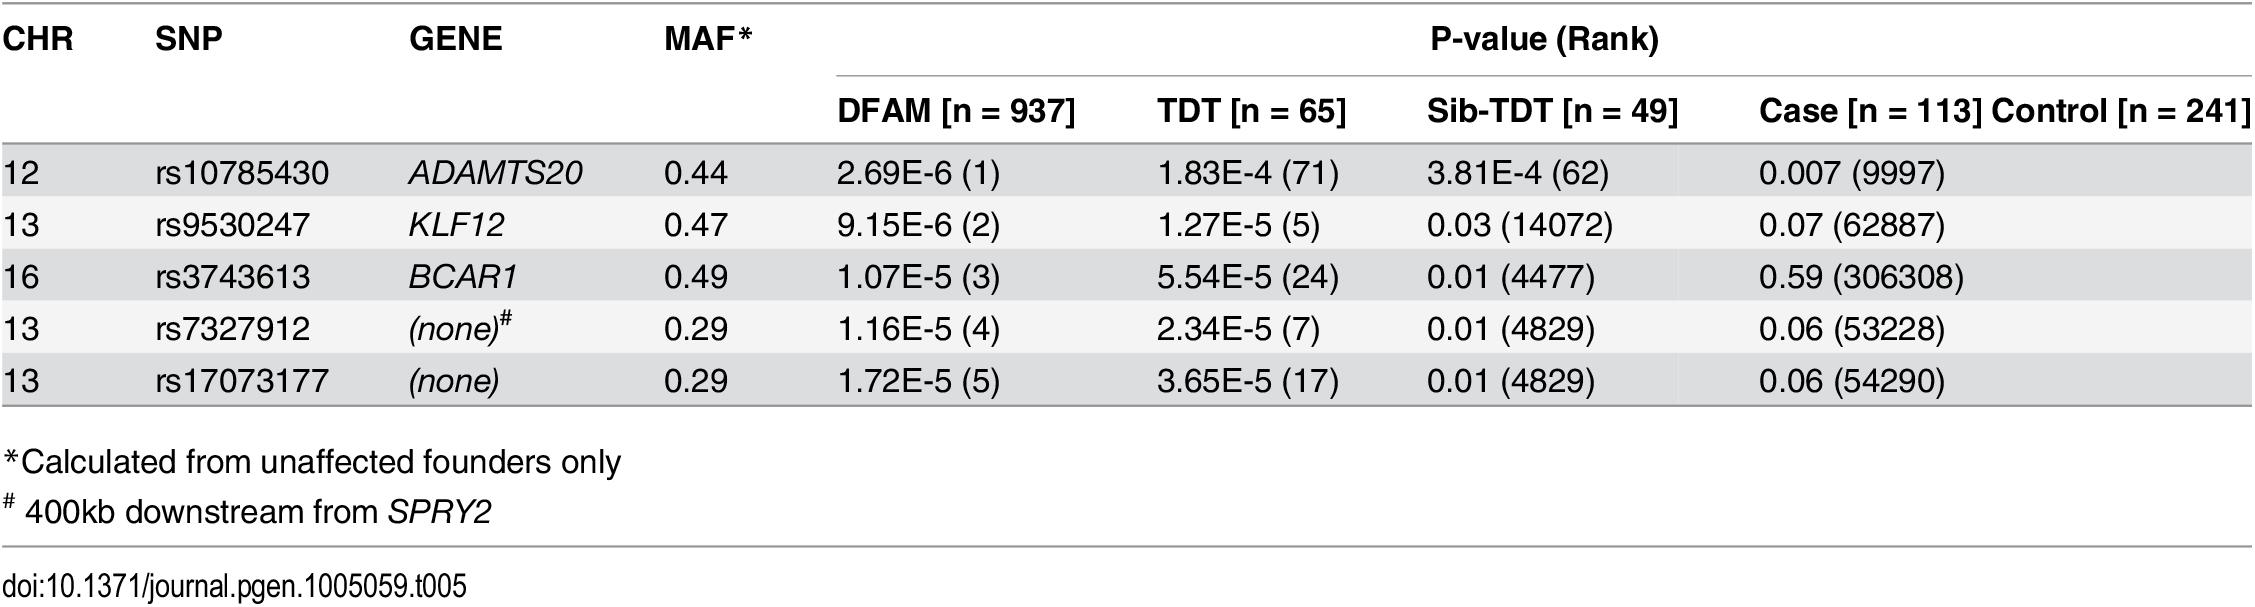 Single SNP analysis of human GWAS data.